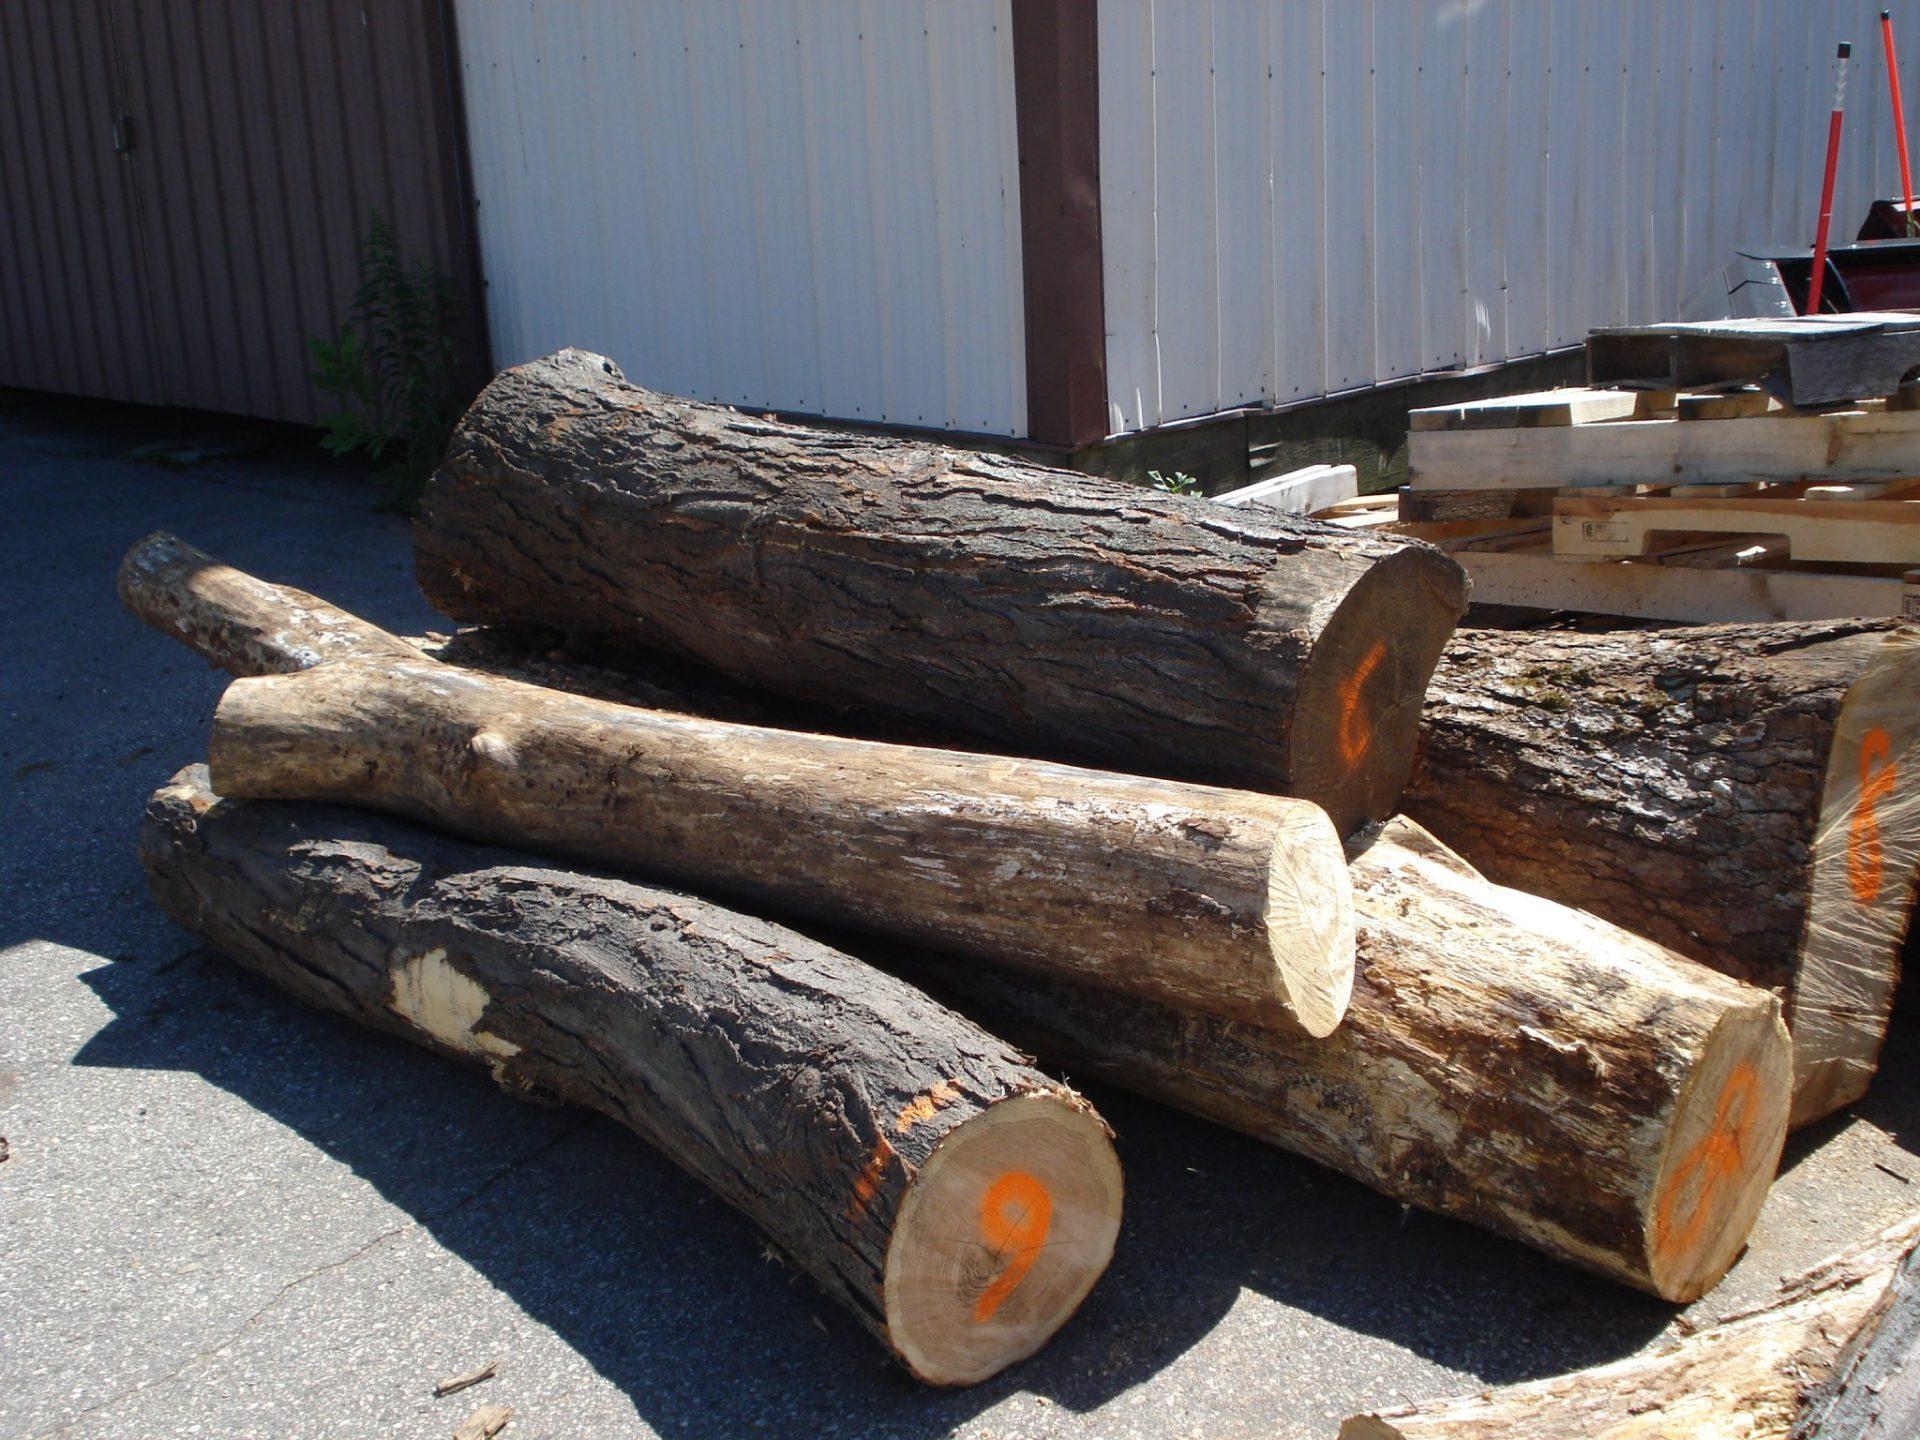 Balance logs for preschoolers